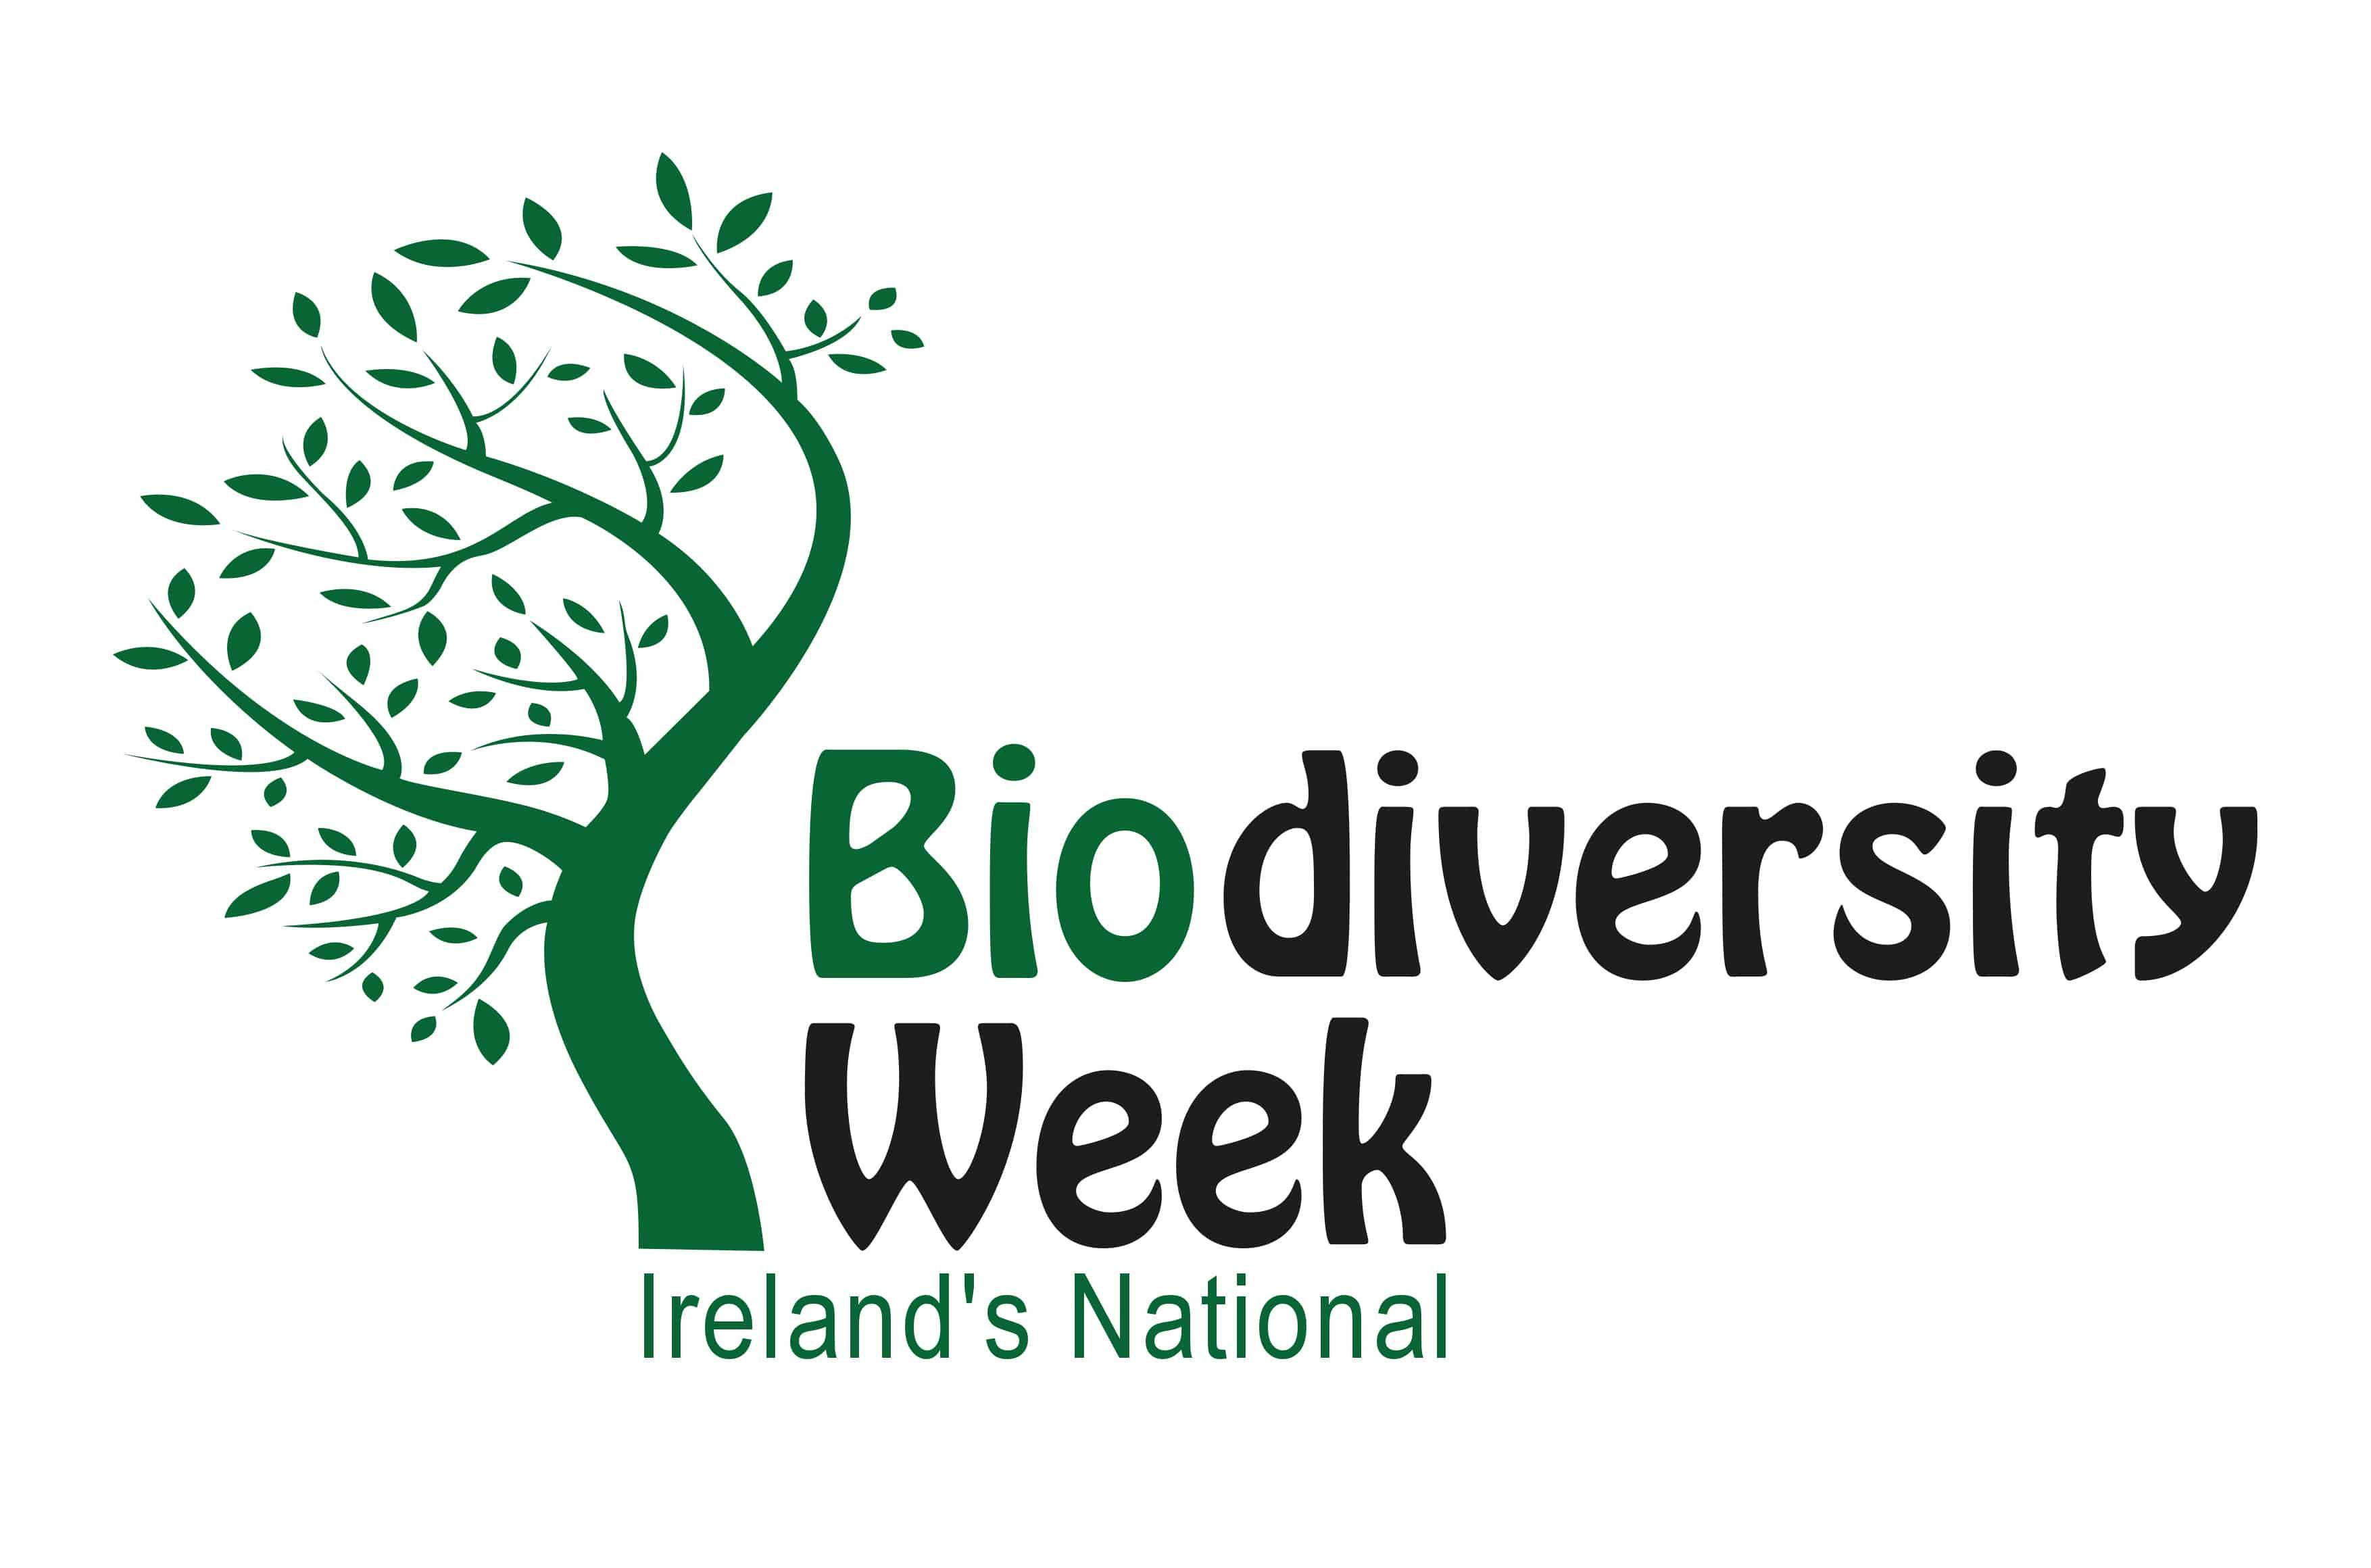 Biodiversity Week logo